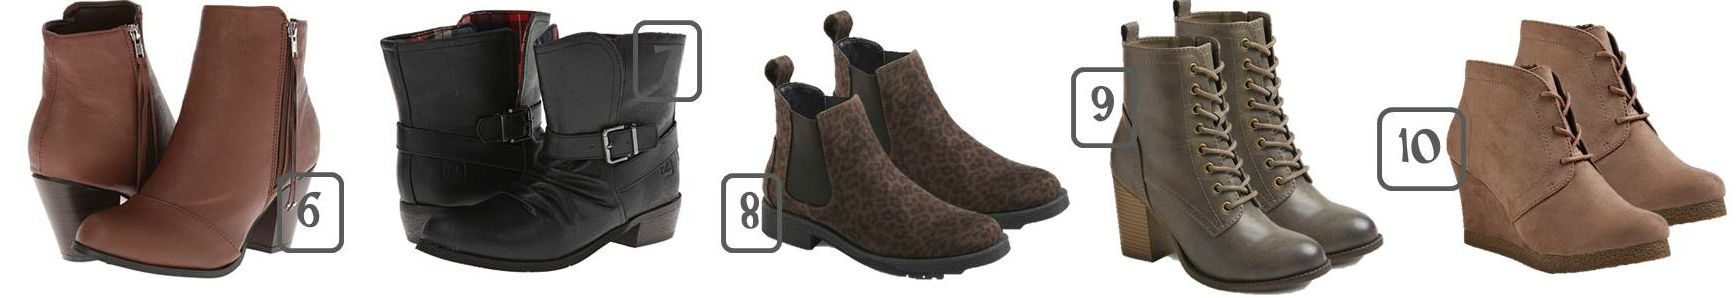 Fall Boots Short Boots